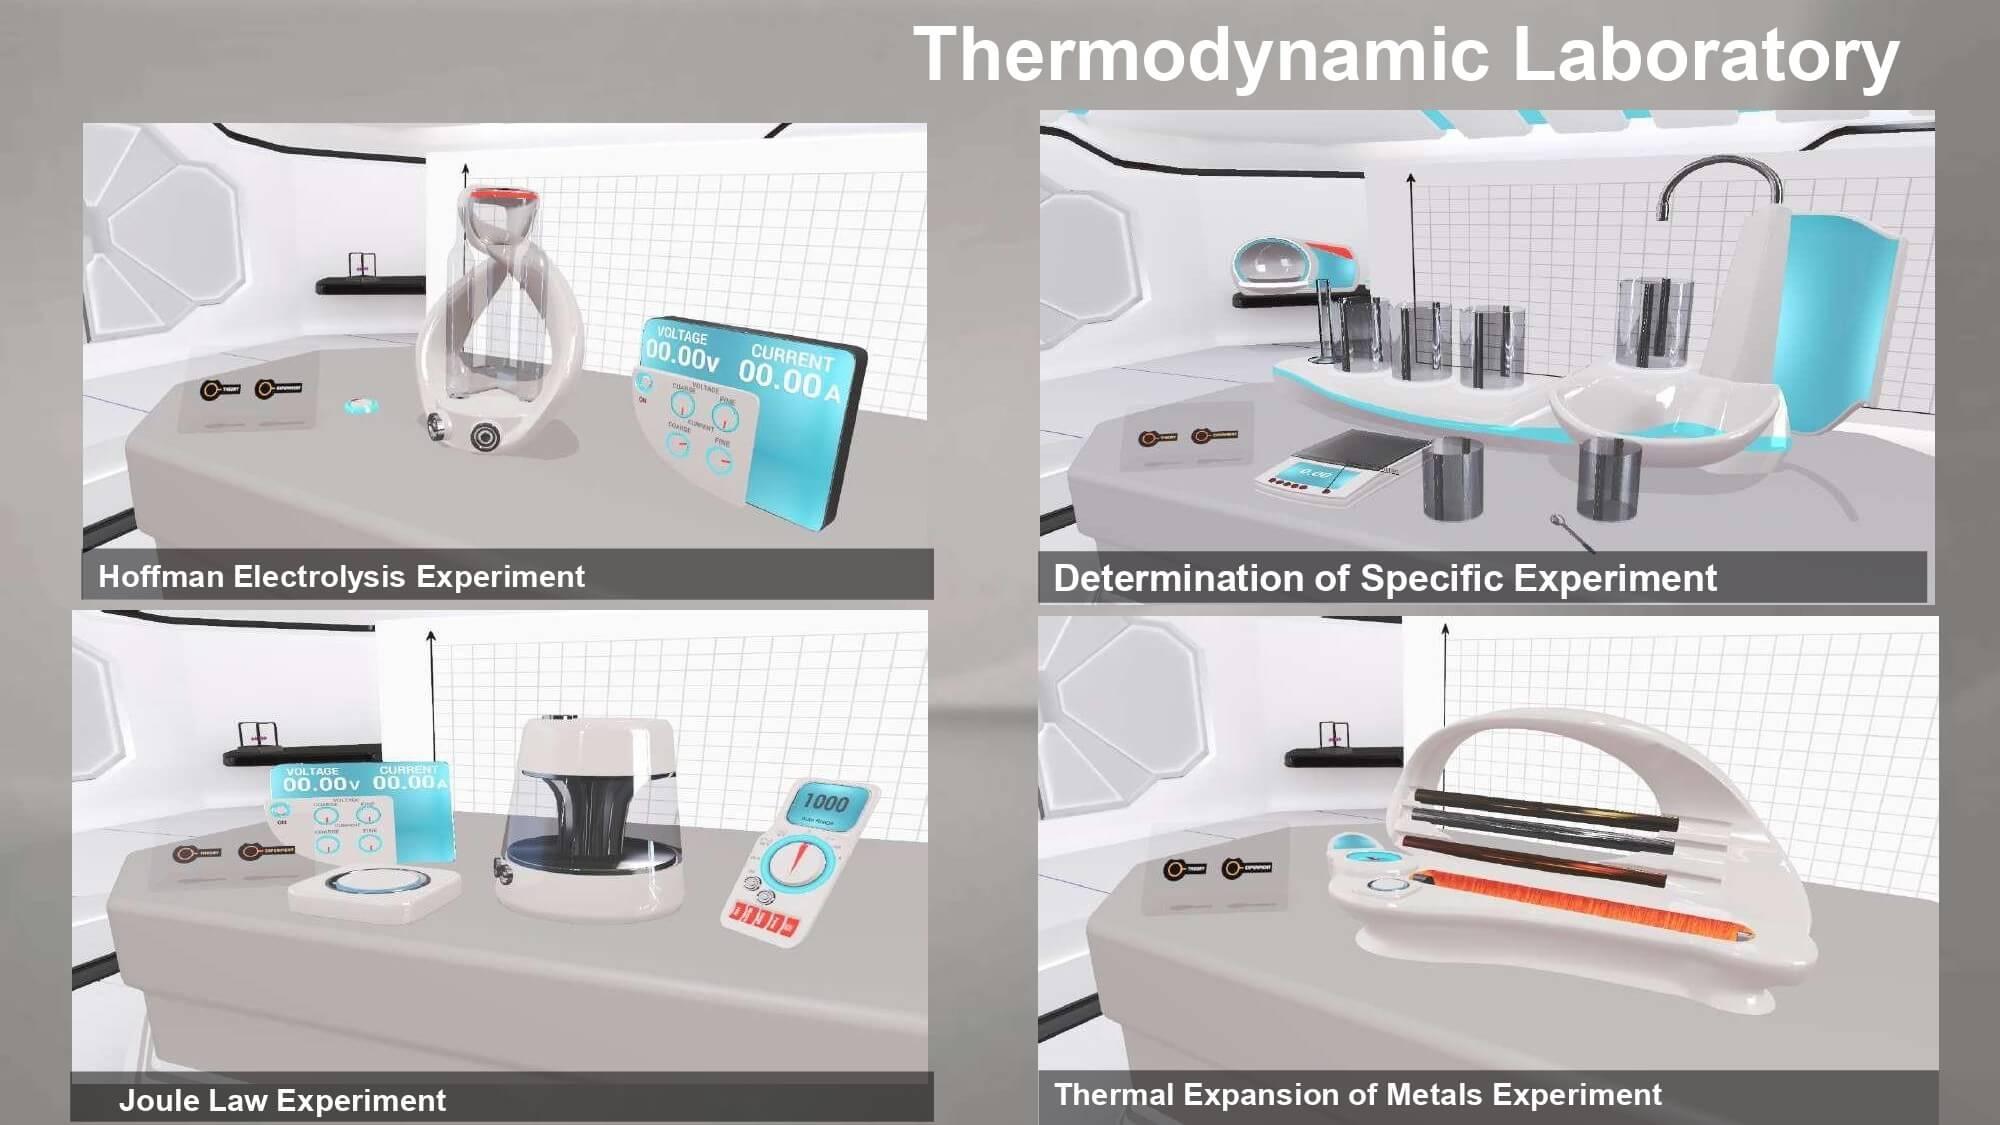 Thermodynamics Laboratory